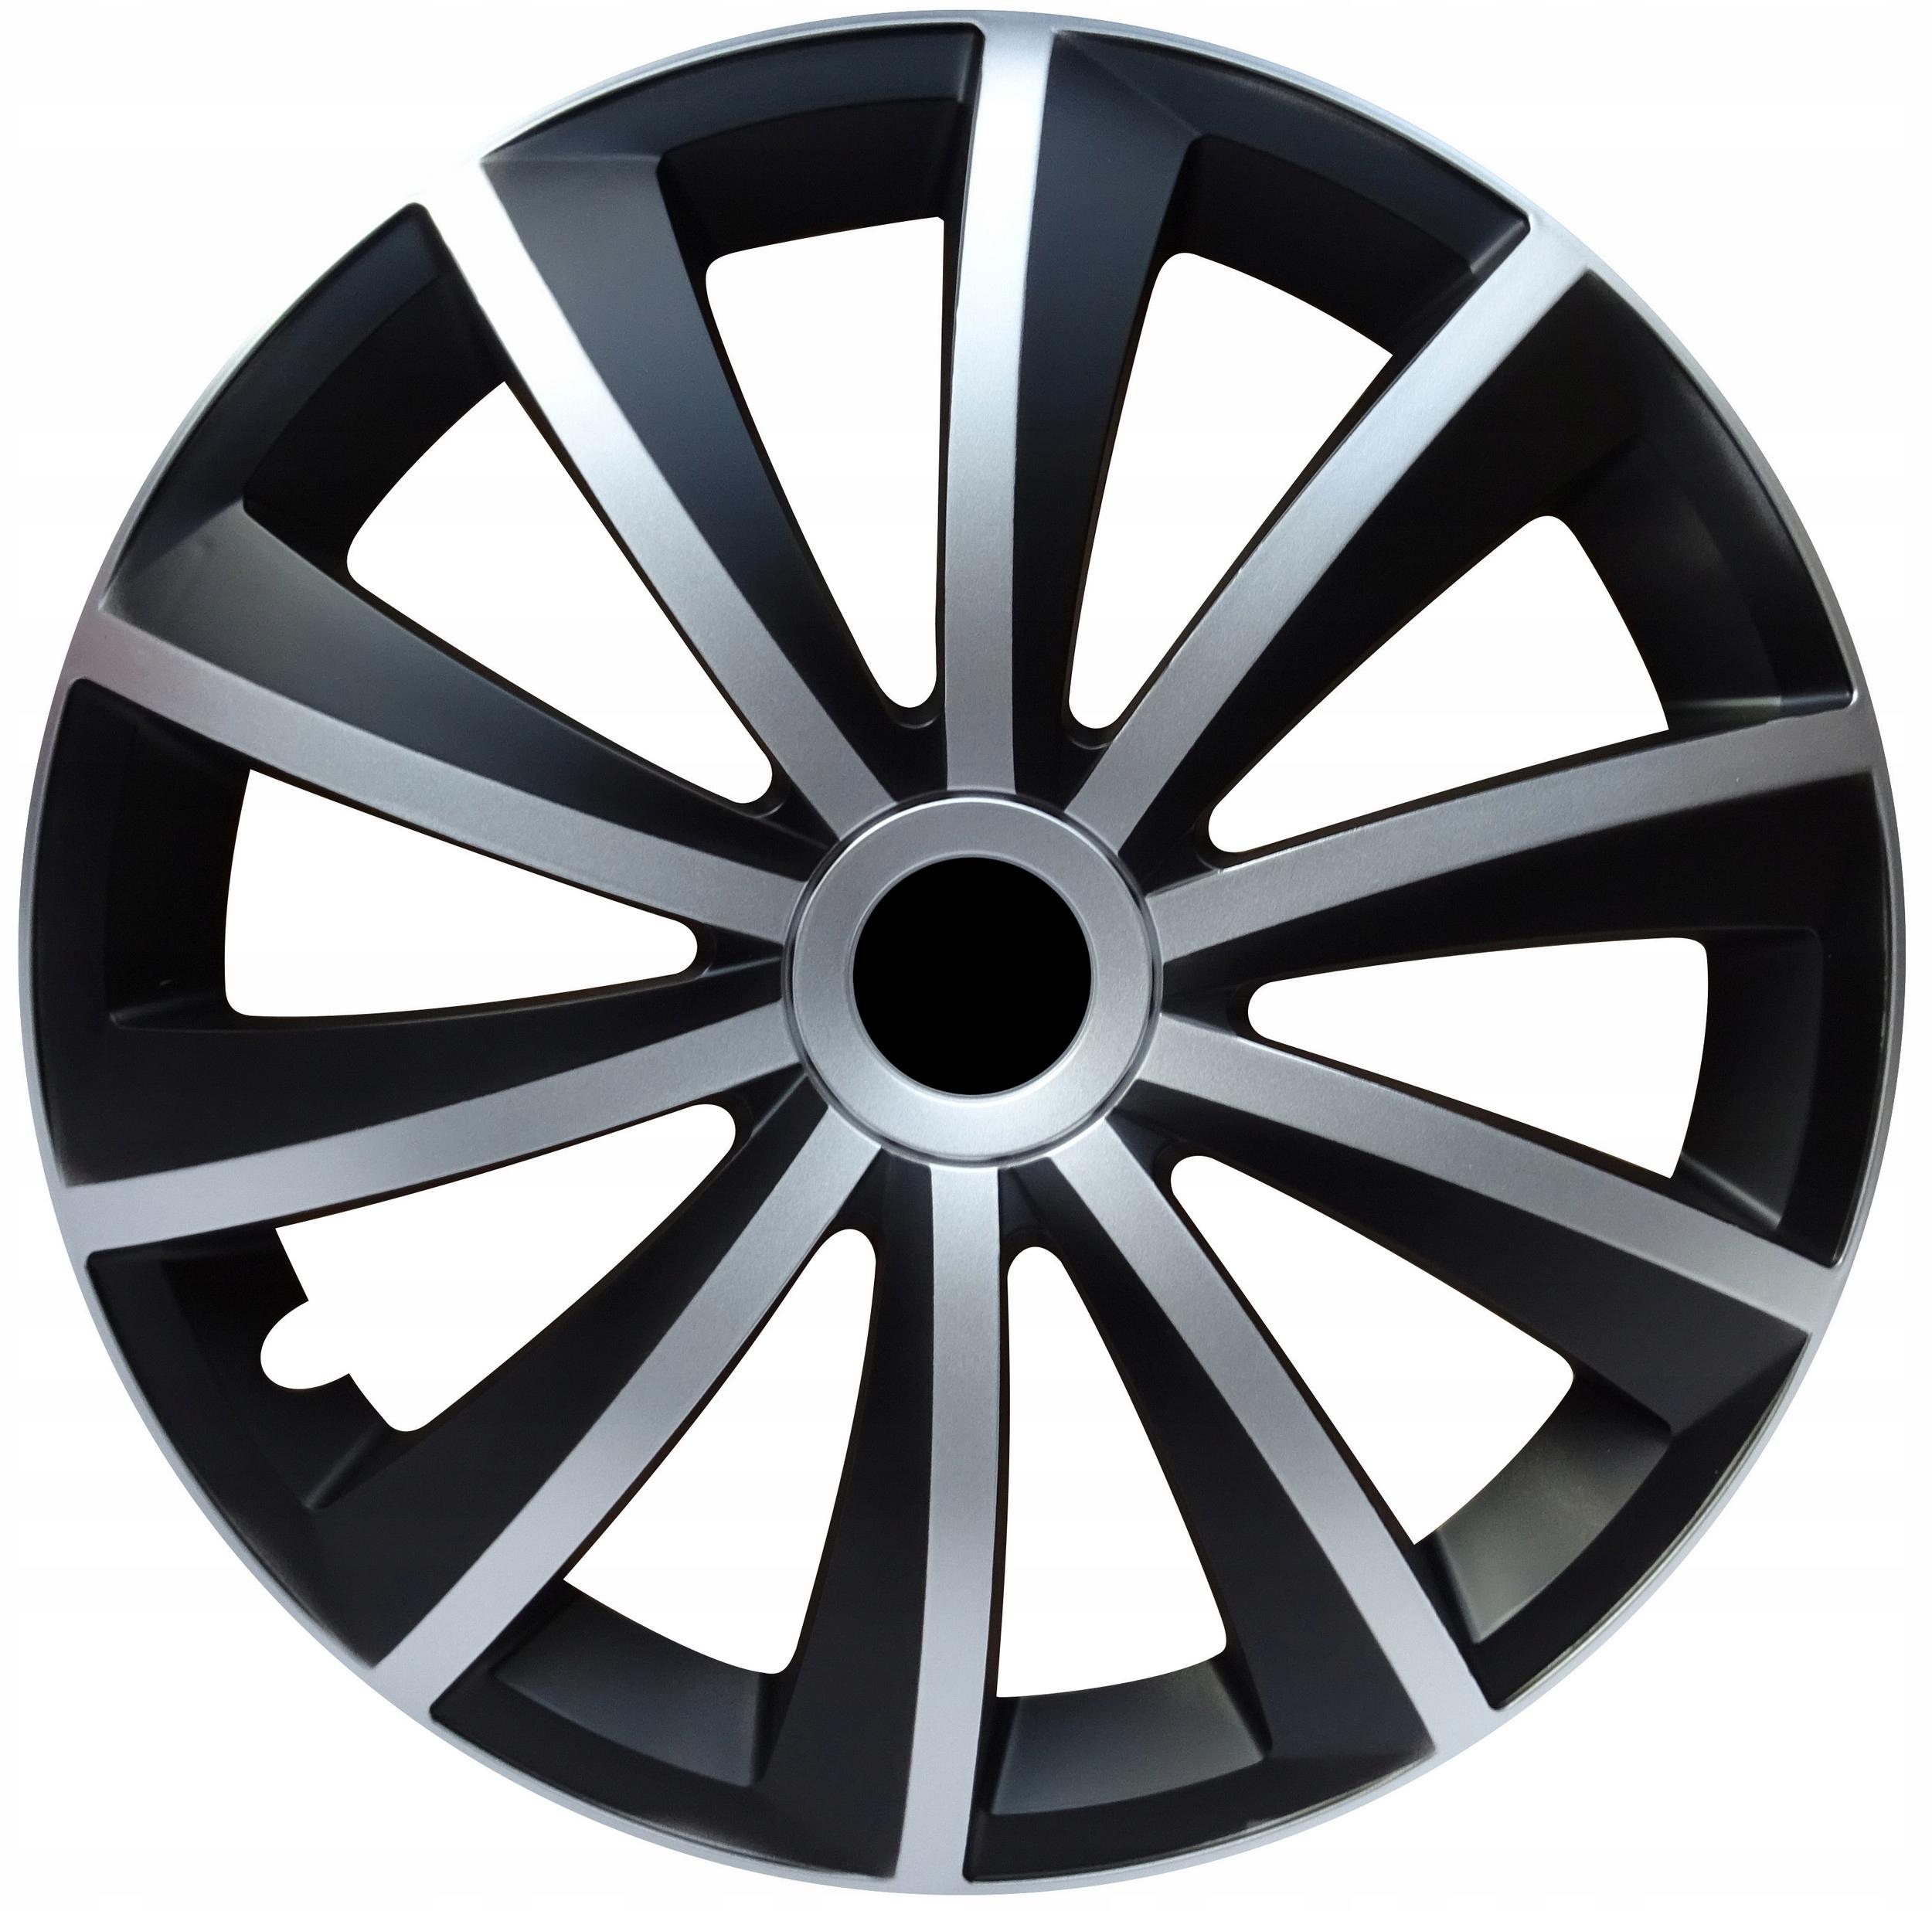 колпаки 15 дюймов для vw opel ford Toyota honda n11